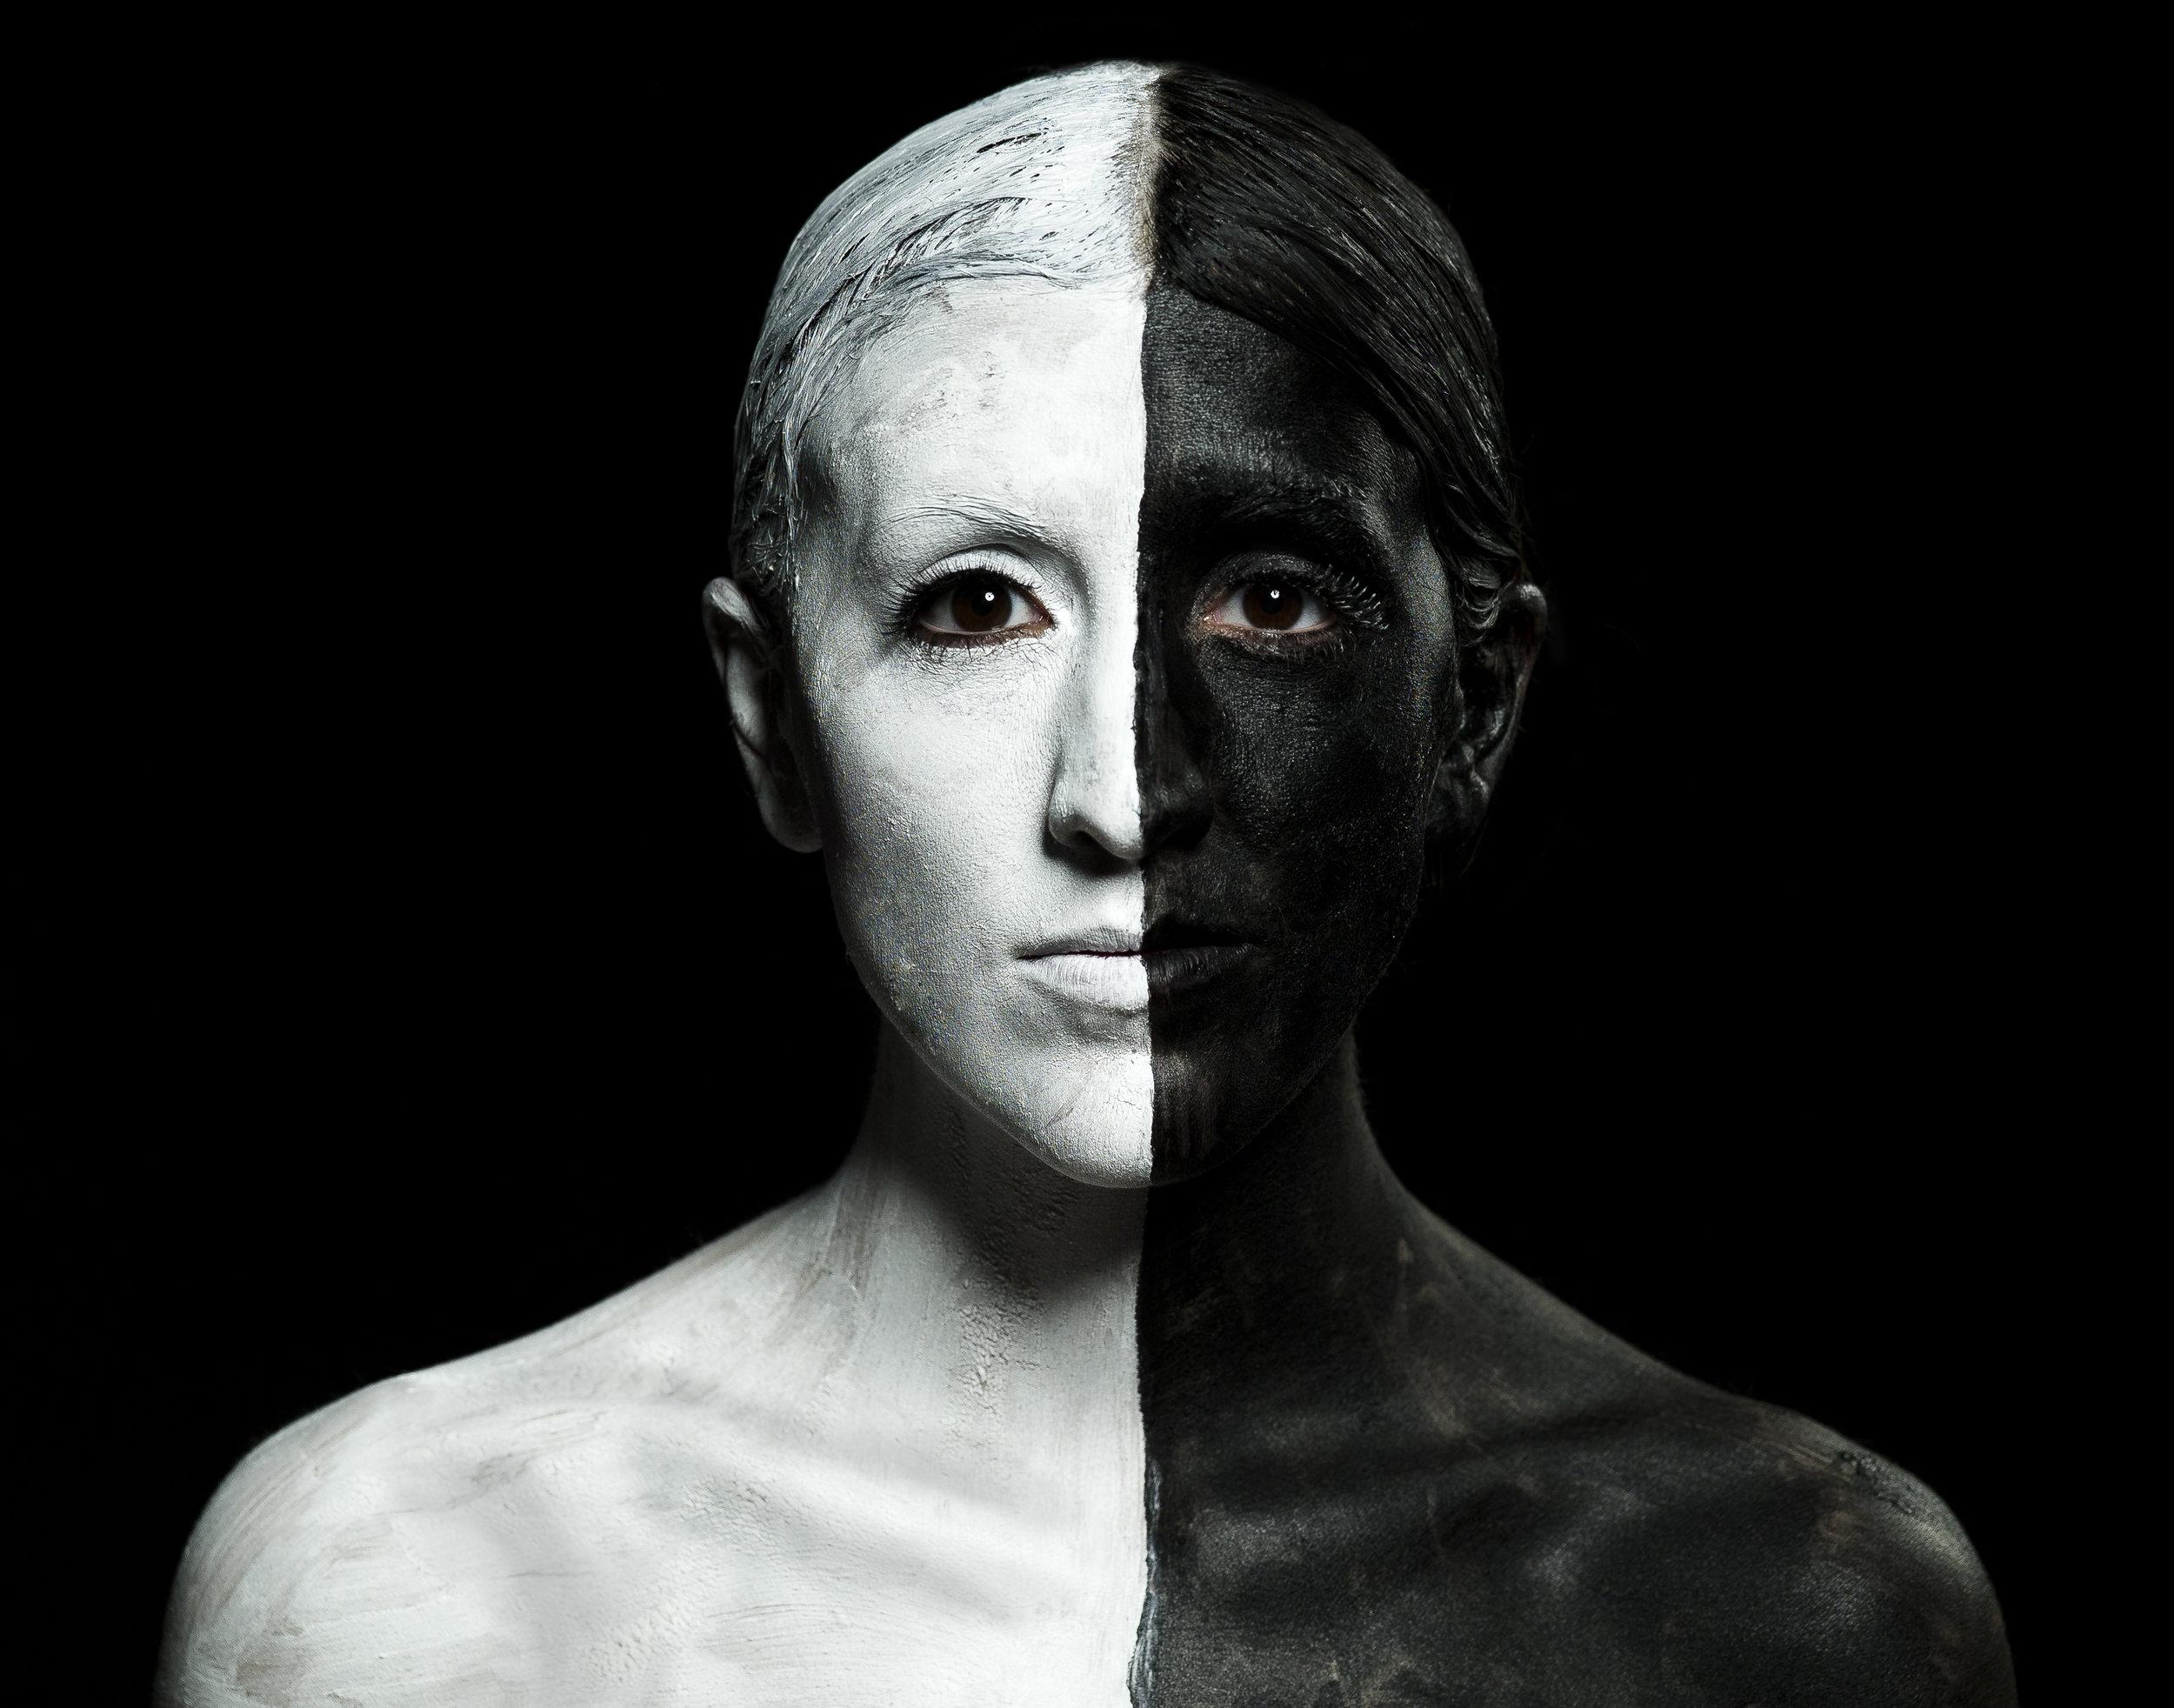 web-image-portrait-2.jpg